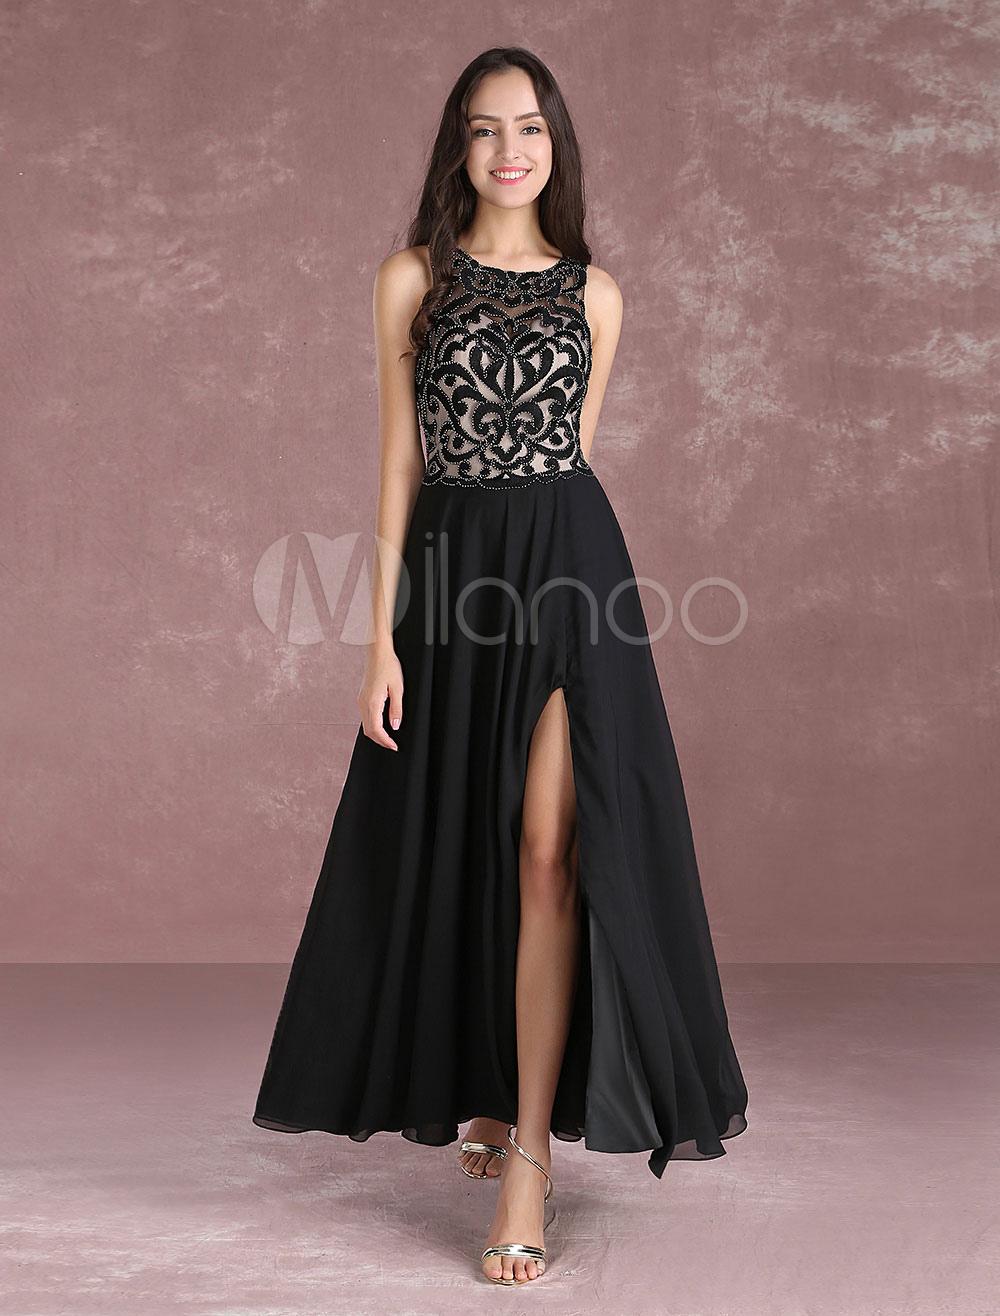 Buy Chiffon Prom Dress Long 2018 Black Illusion Beading Evening Dress Jewel Sleeveless Slit Floor Length Party Dress for $152.99 in Milanoo store